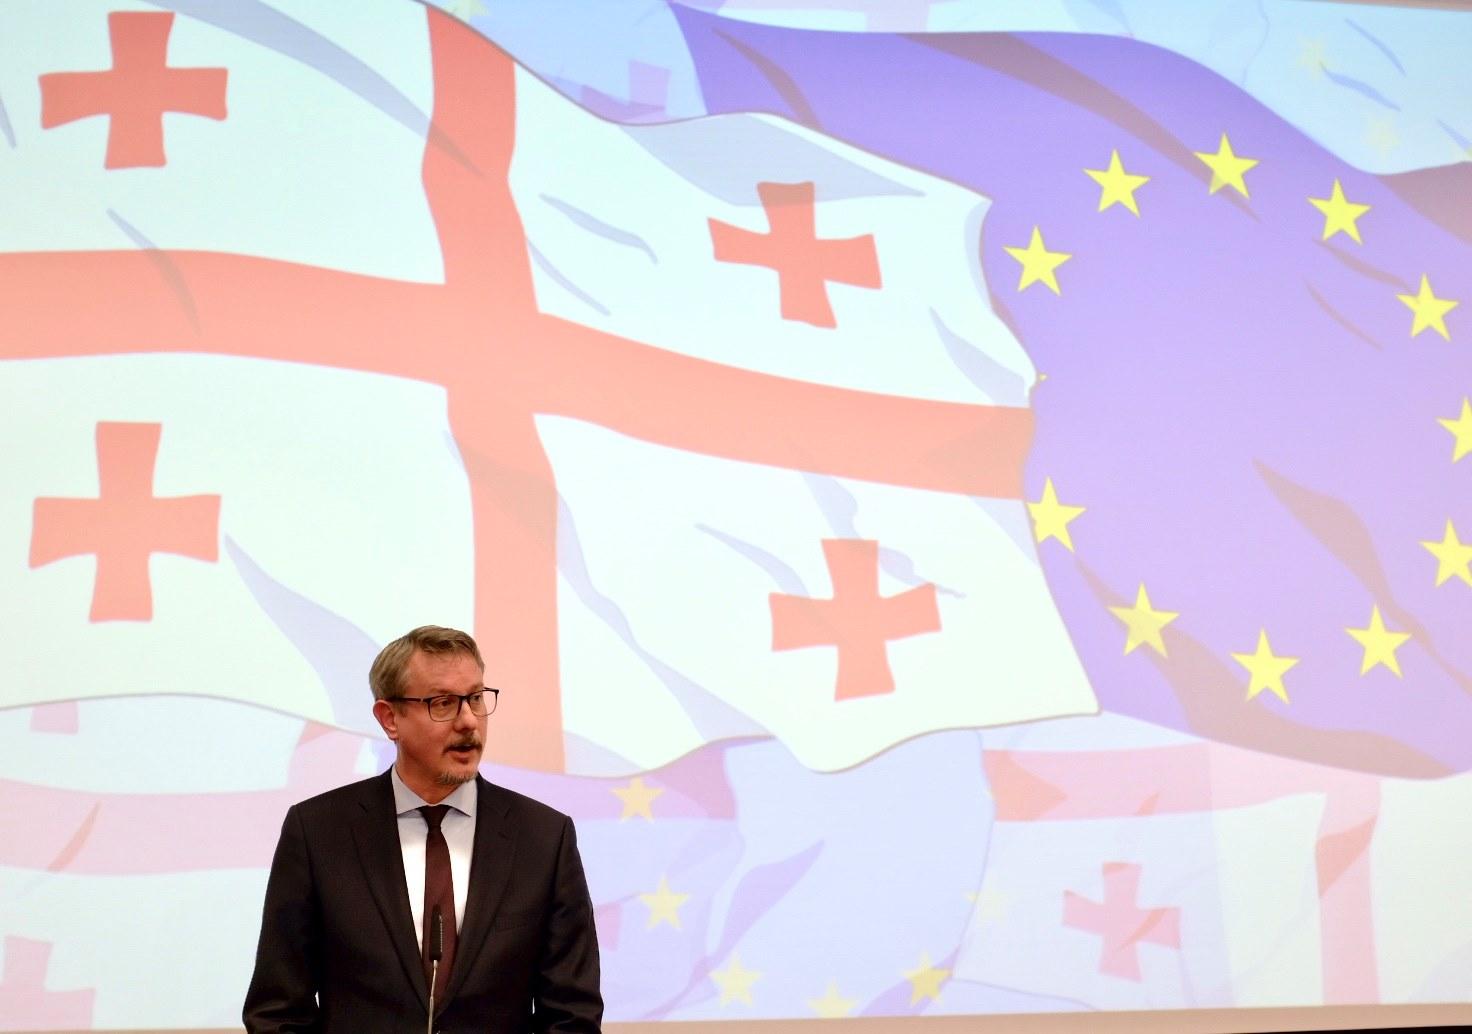 Carl Hartzell 10 #новости бордеризация, Грузия-ЕС, евросоюз, Карл Харцель, Тахтисдзири